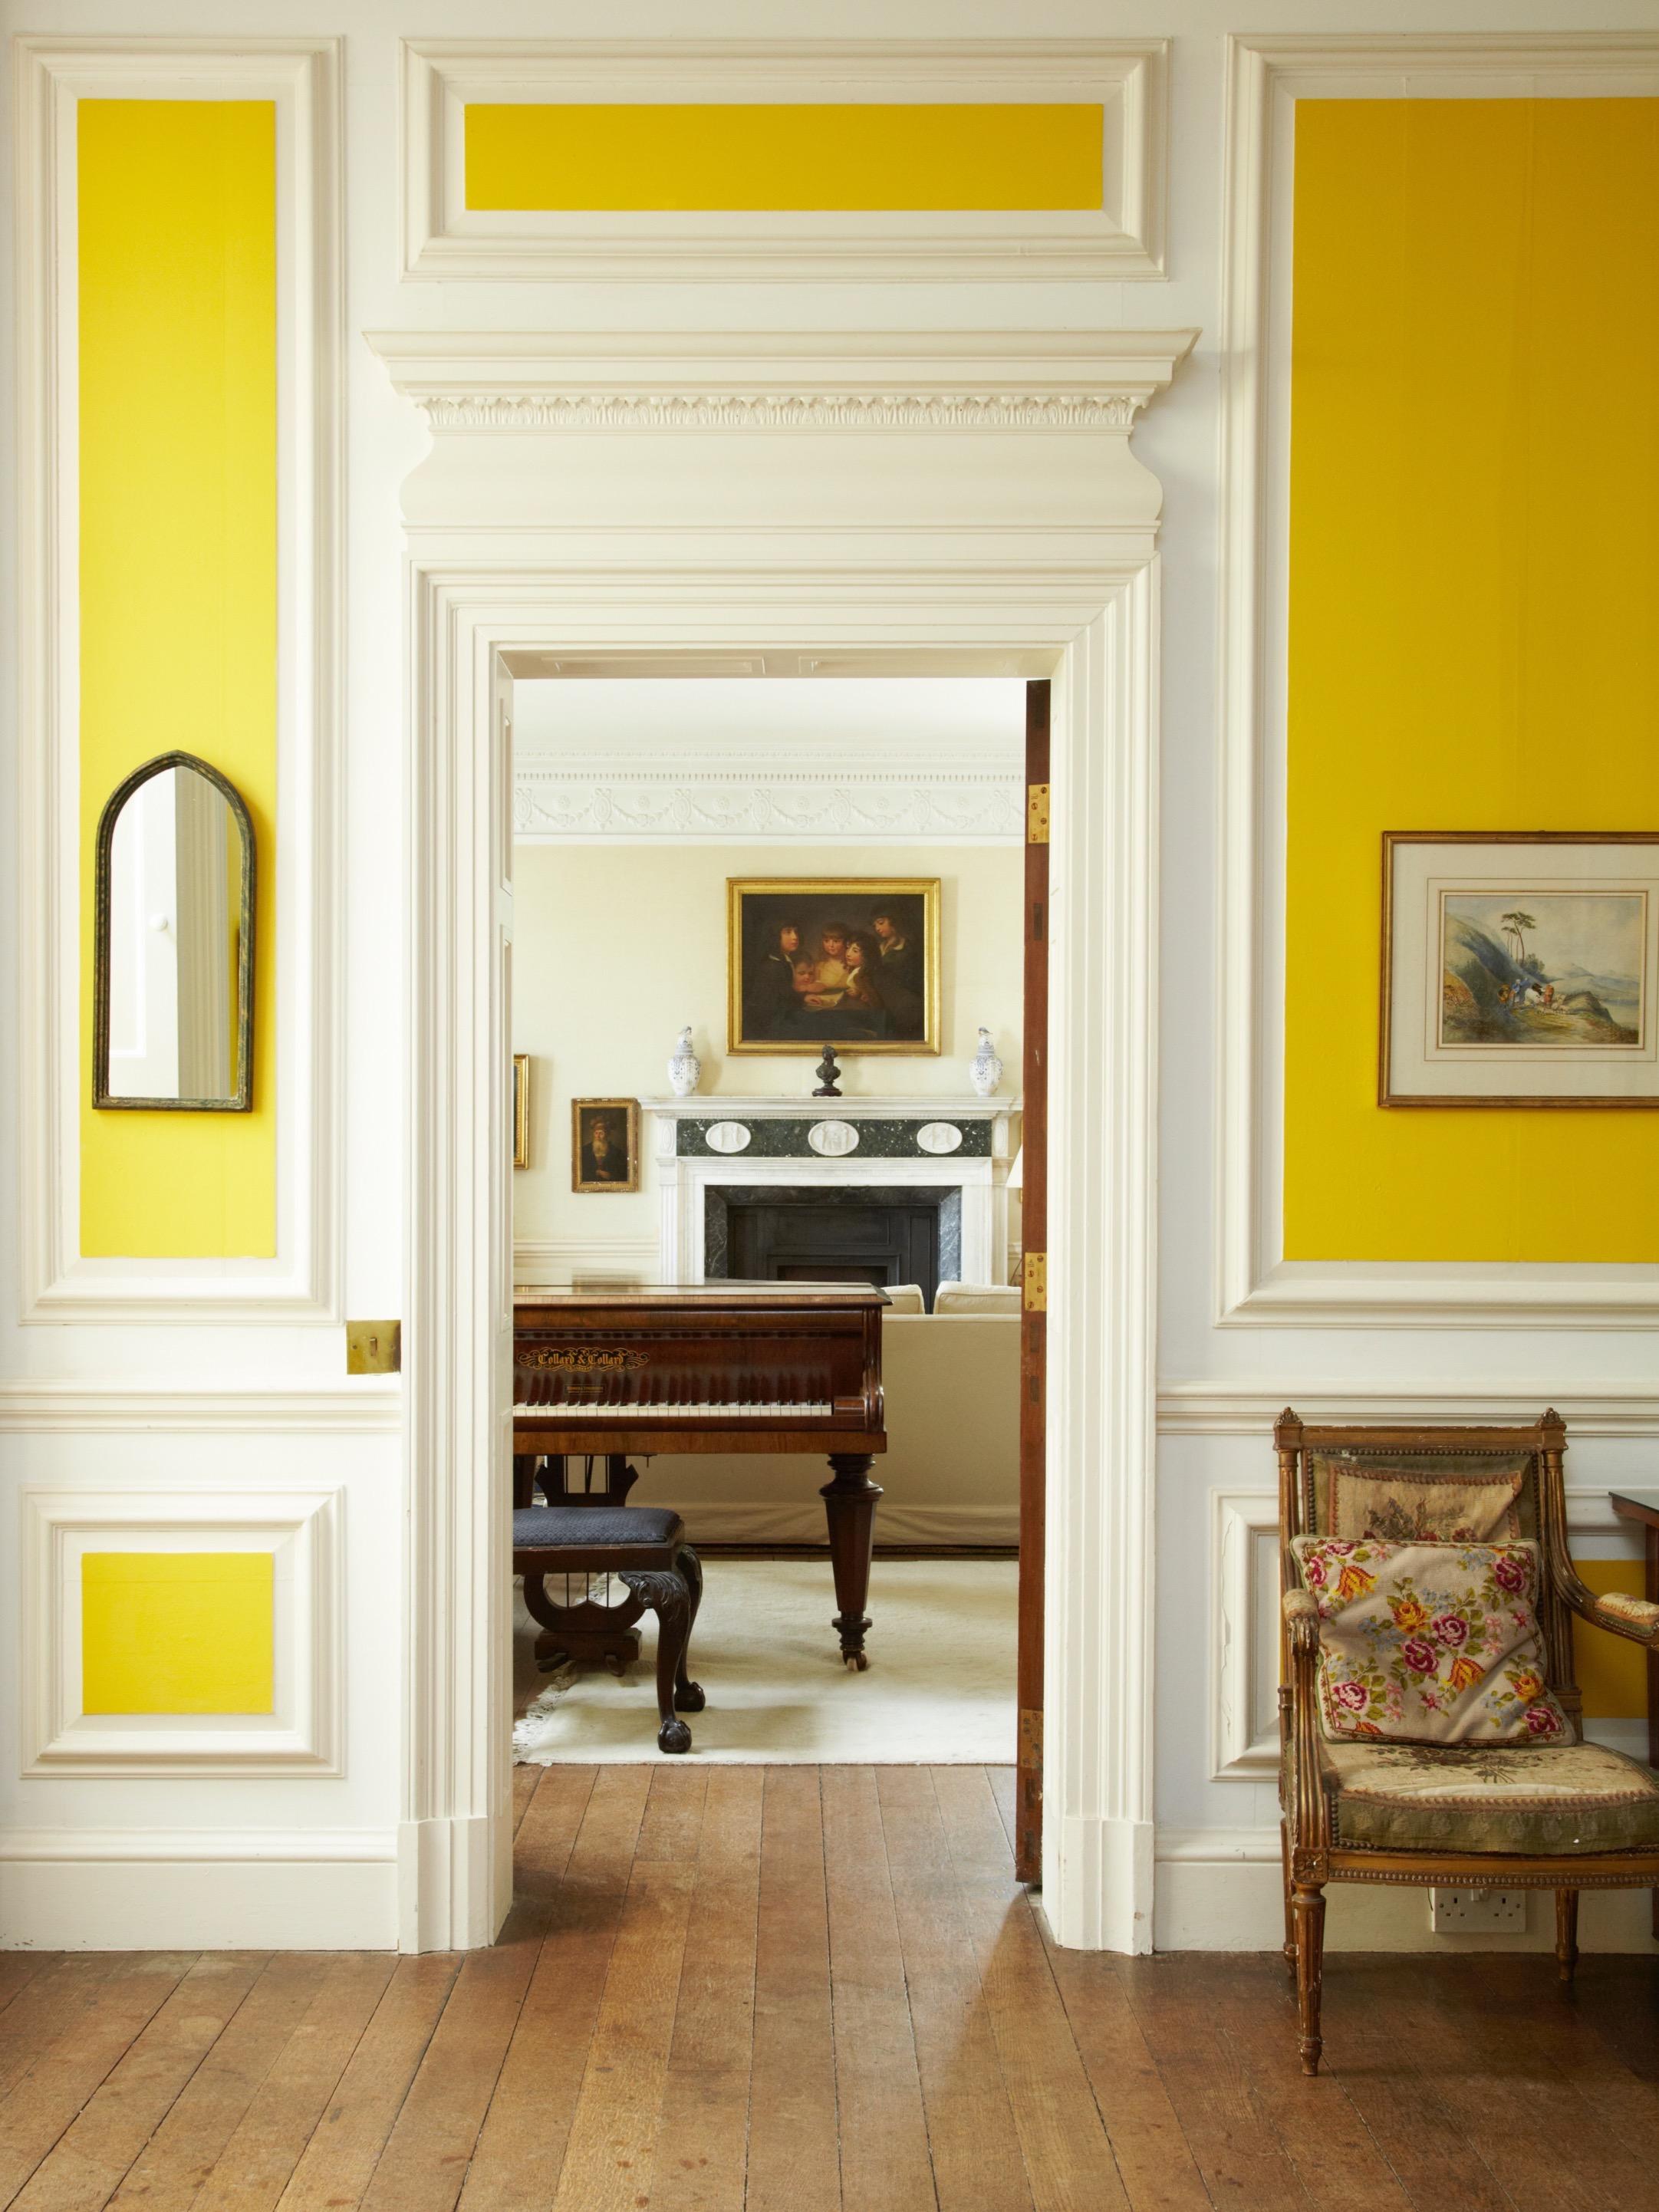 PoundonHouse_Yellow_room_Bridget_Pierson-1.jpg